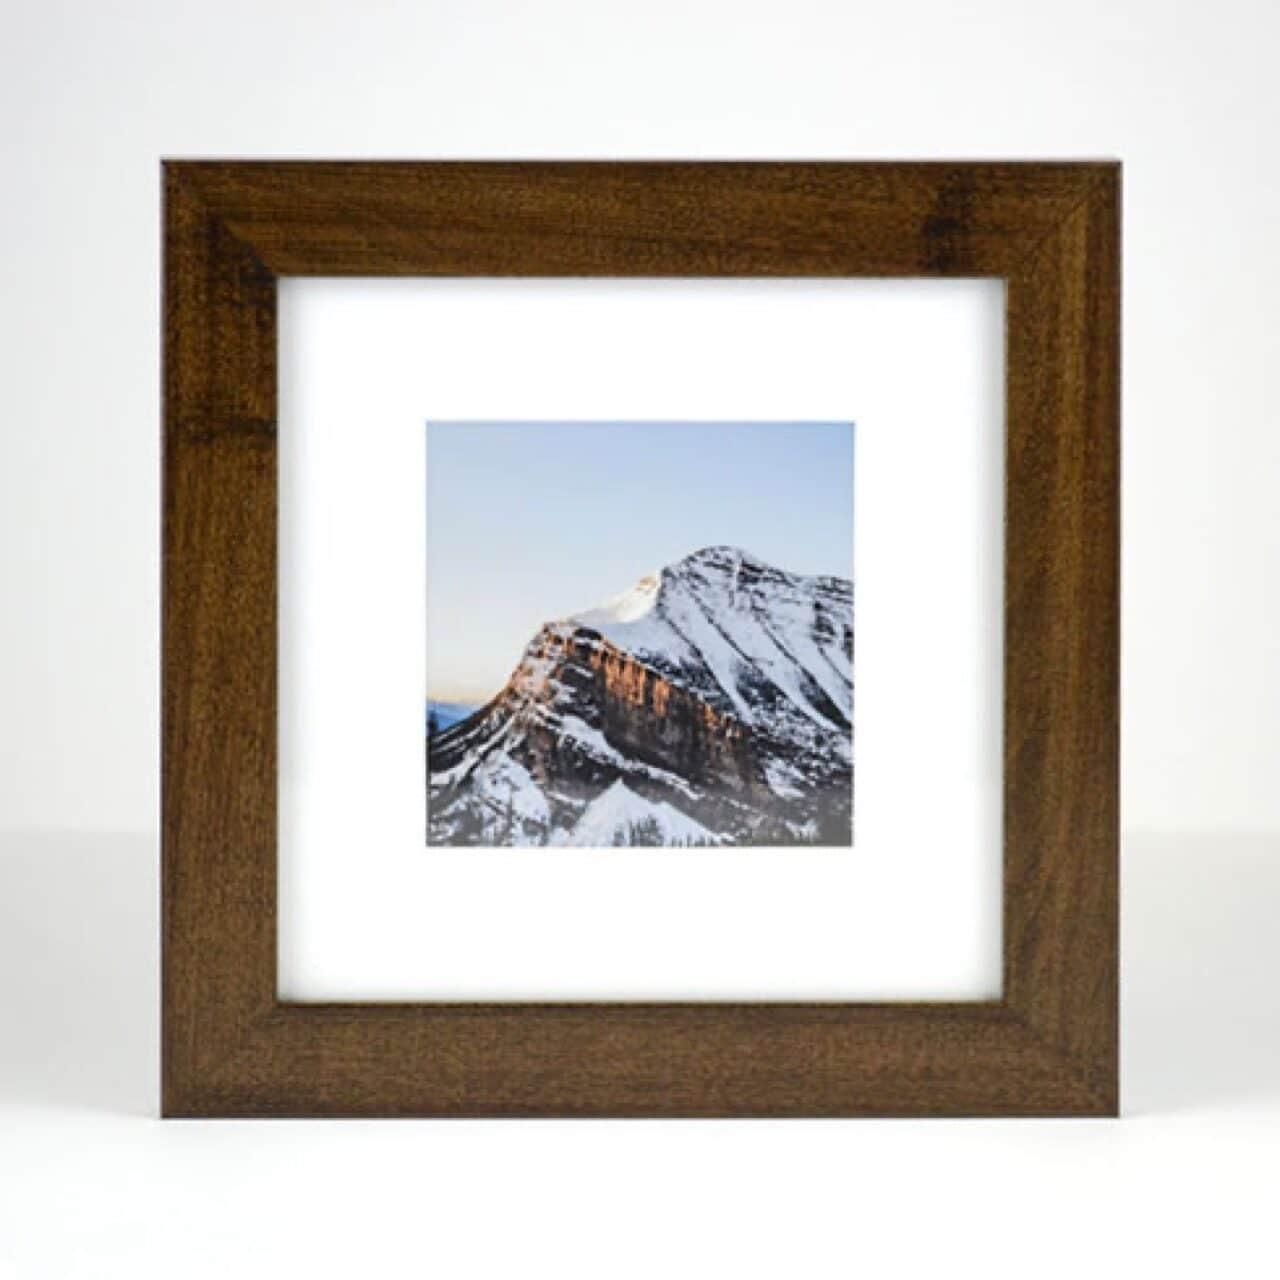 Dayton frame style